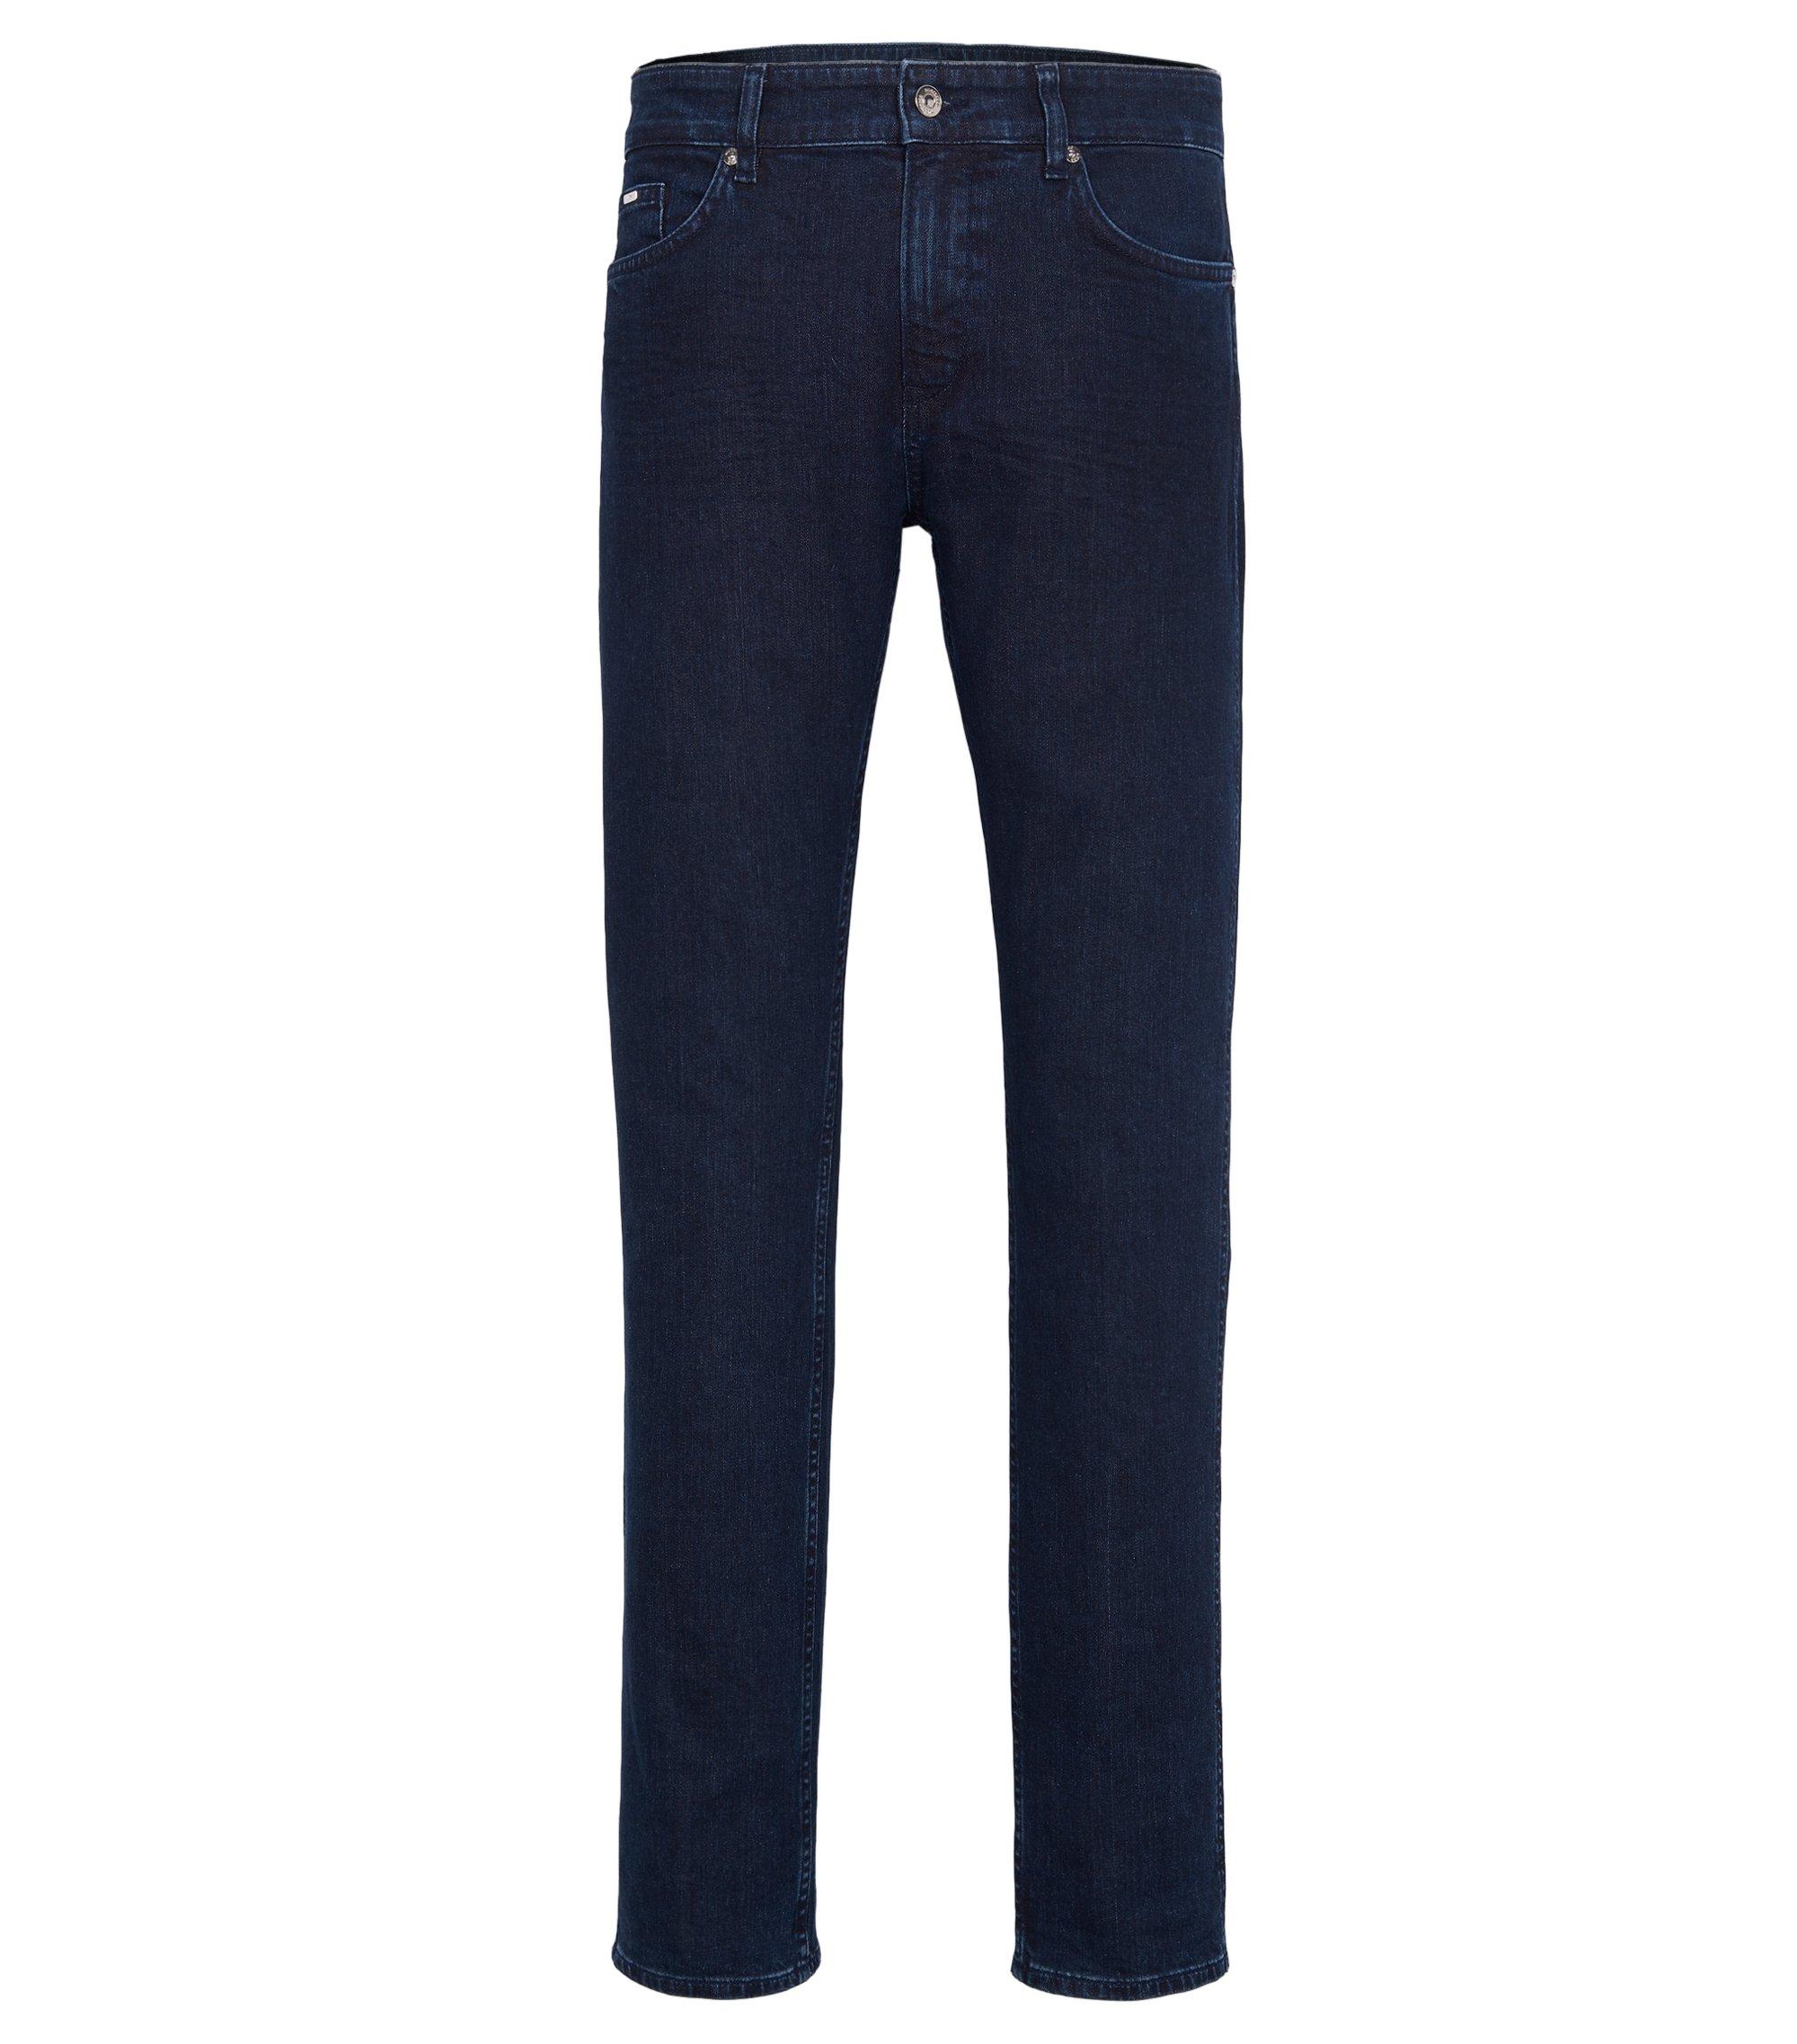 8 oz Stretch Cotton Jean, Slim Fit   Delaware, Dark Blue